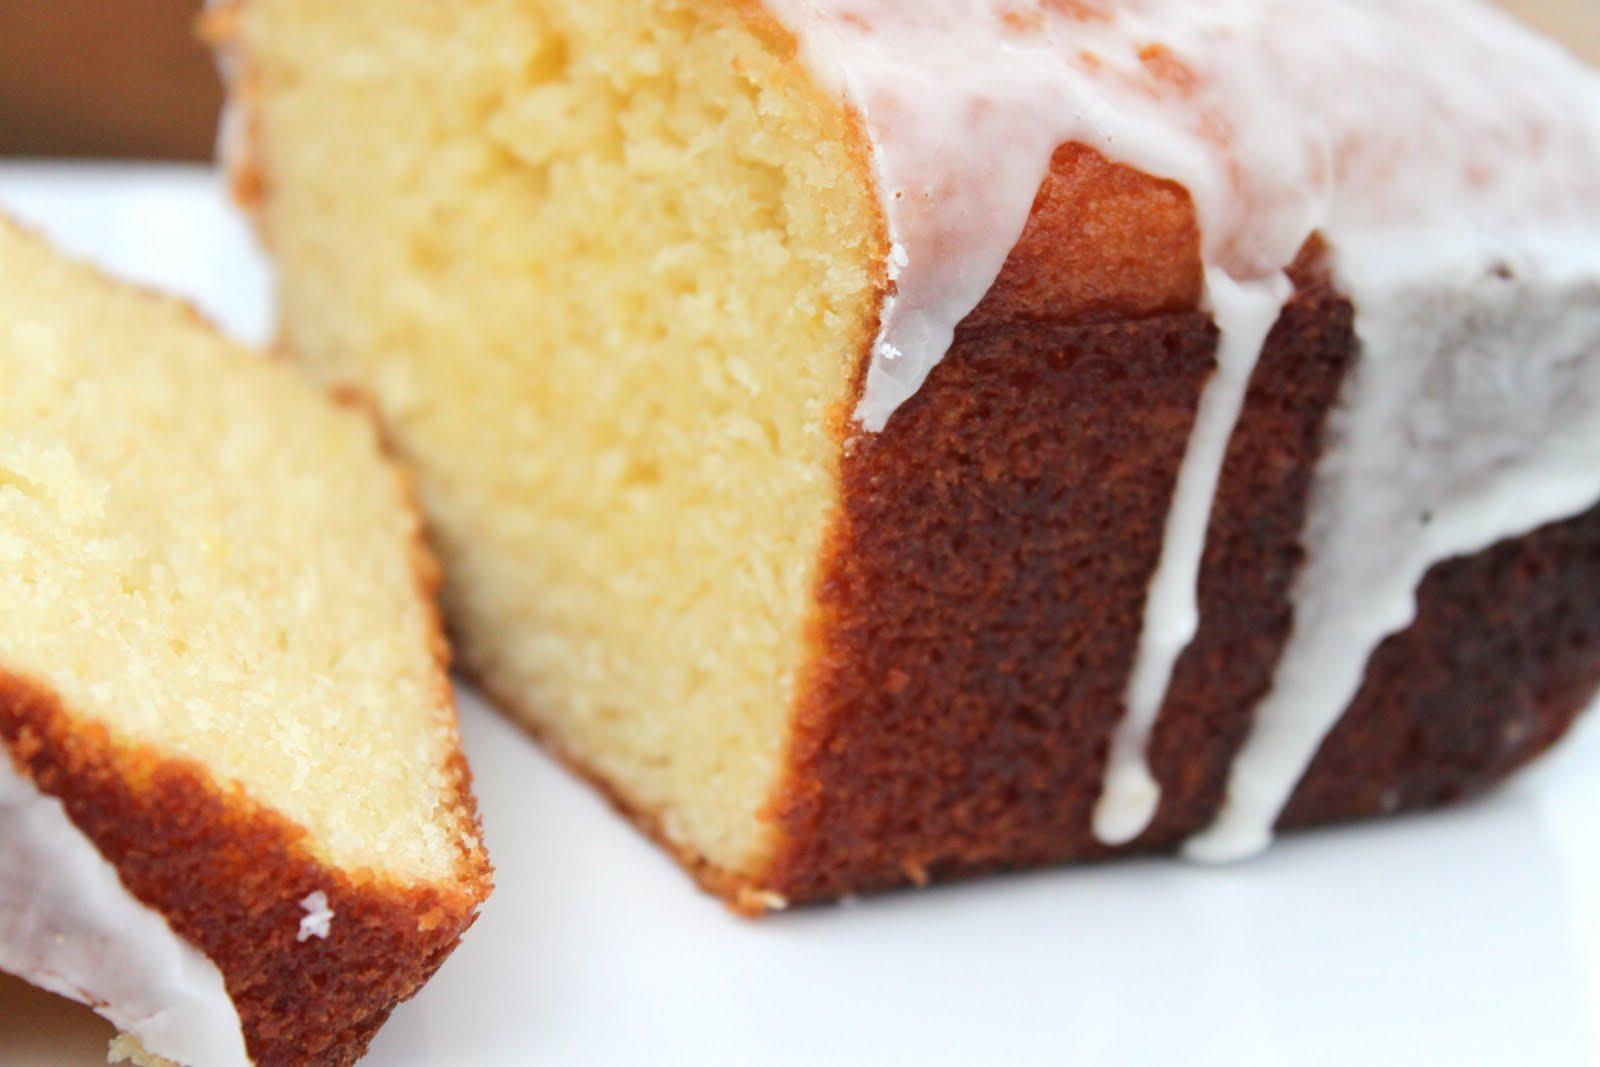 Barefoot Contessa Lemon Cake